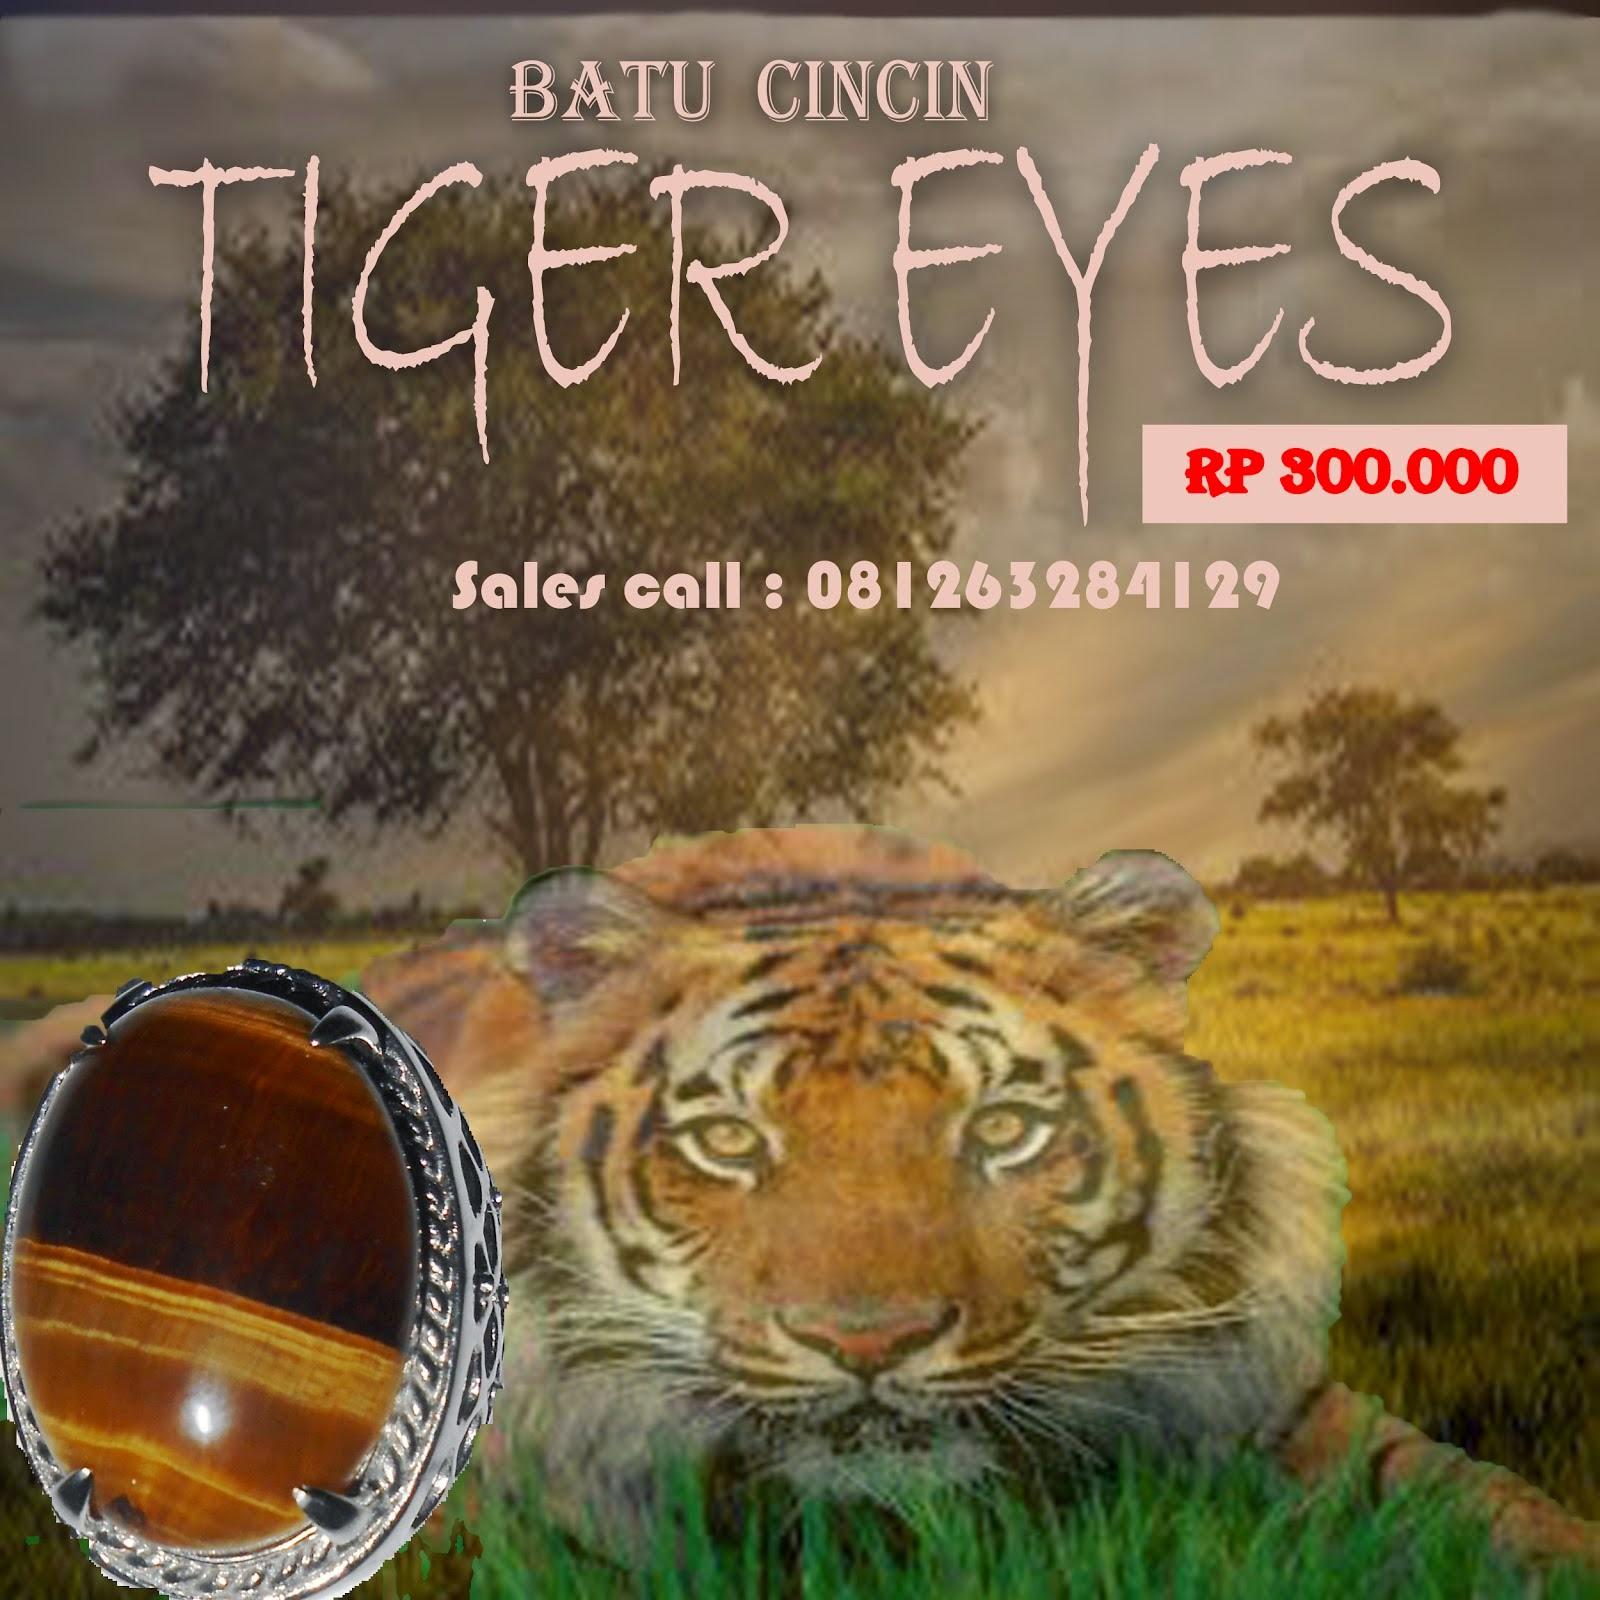 Batu giok tiger eyes